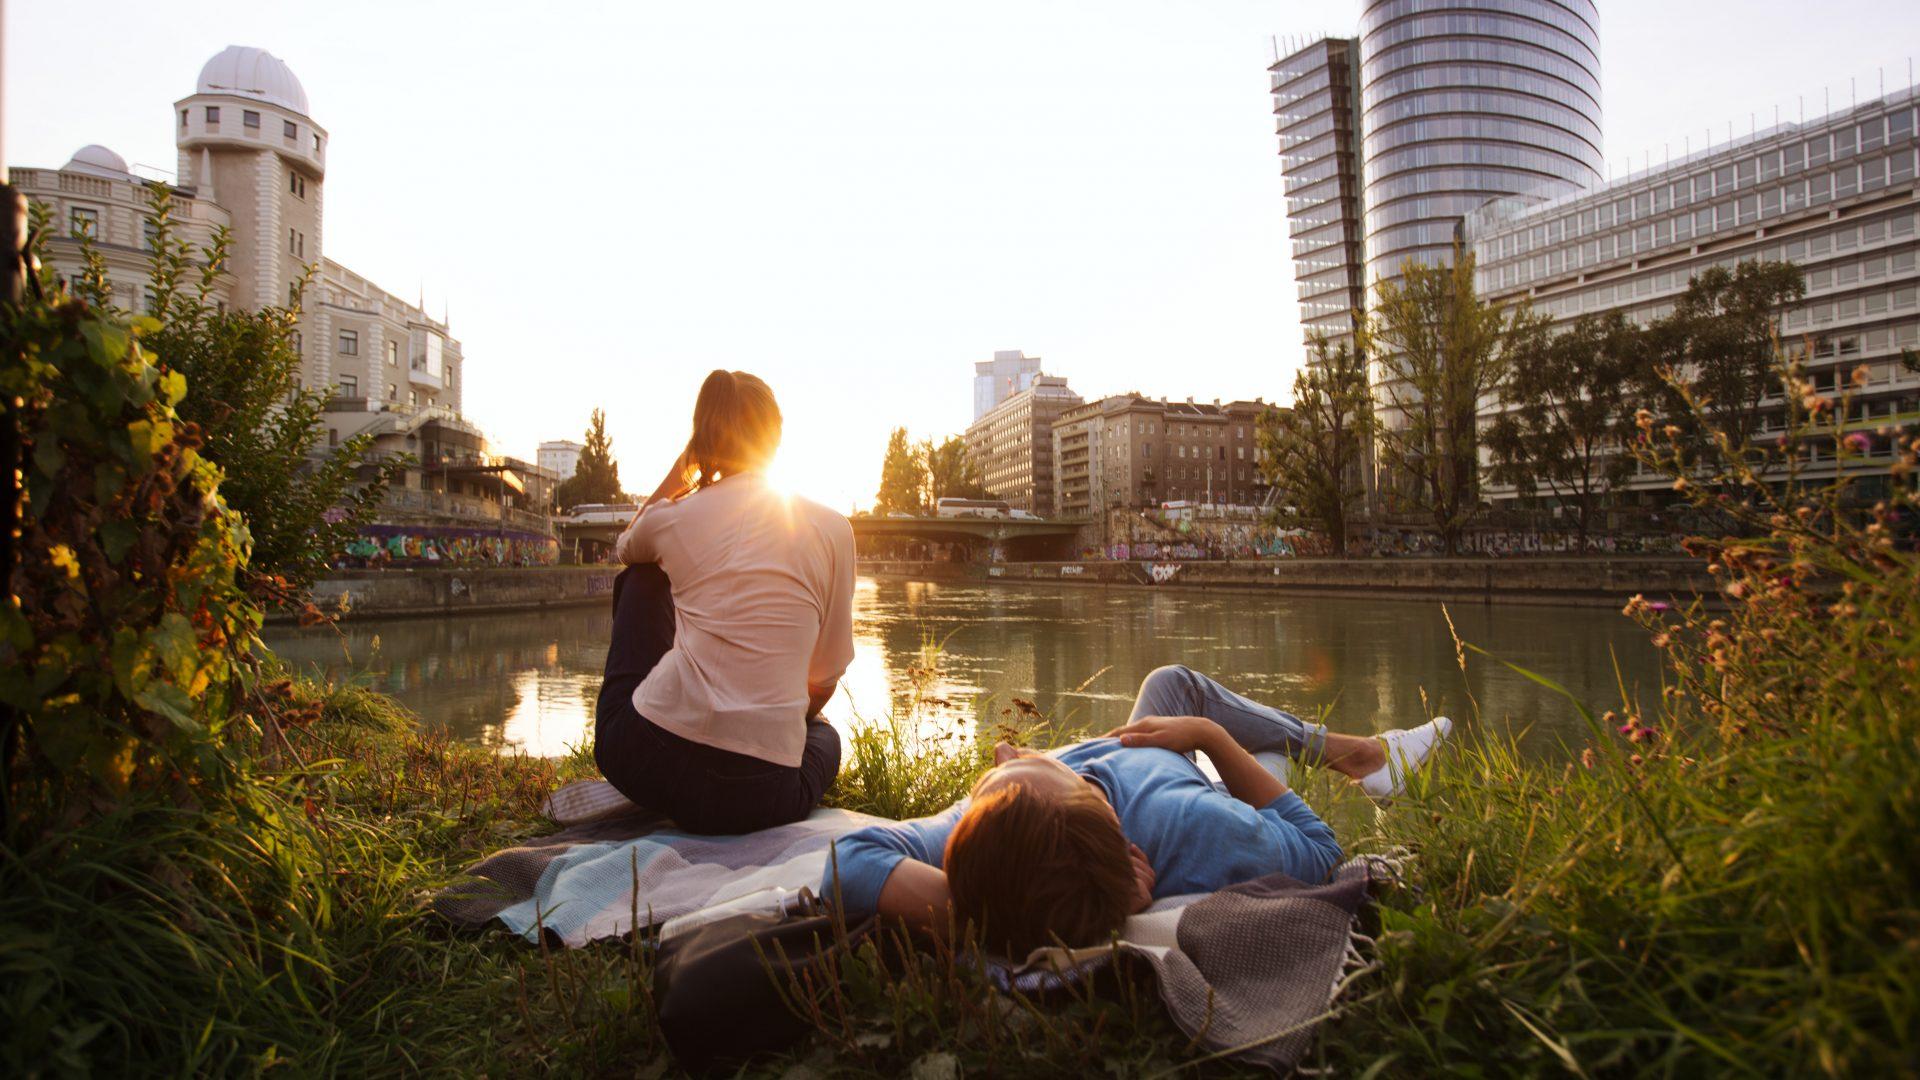 Sans Souci Wien Donaukanal